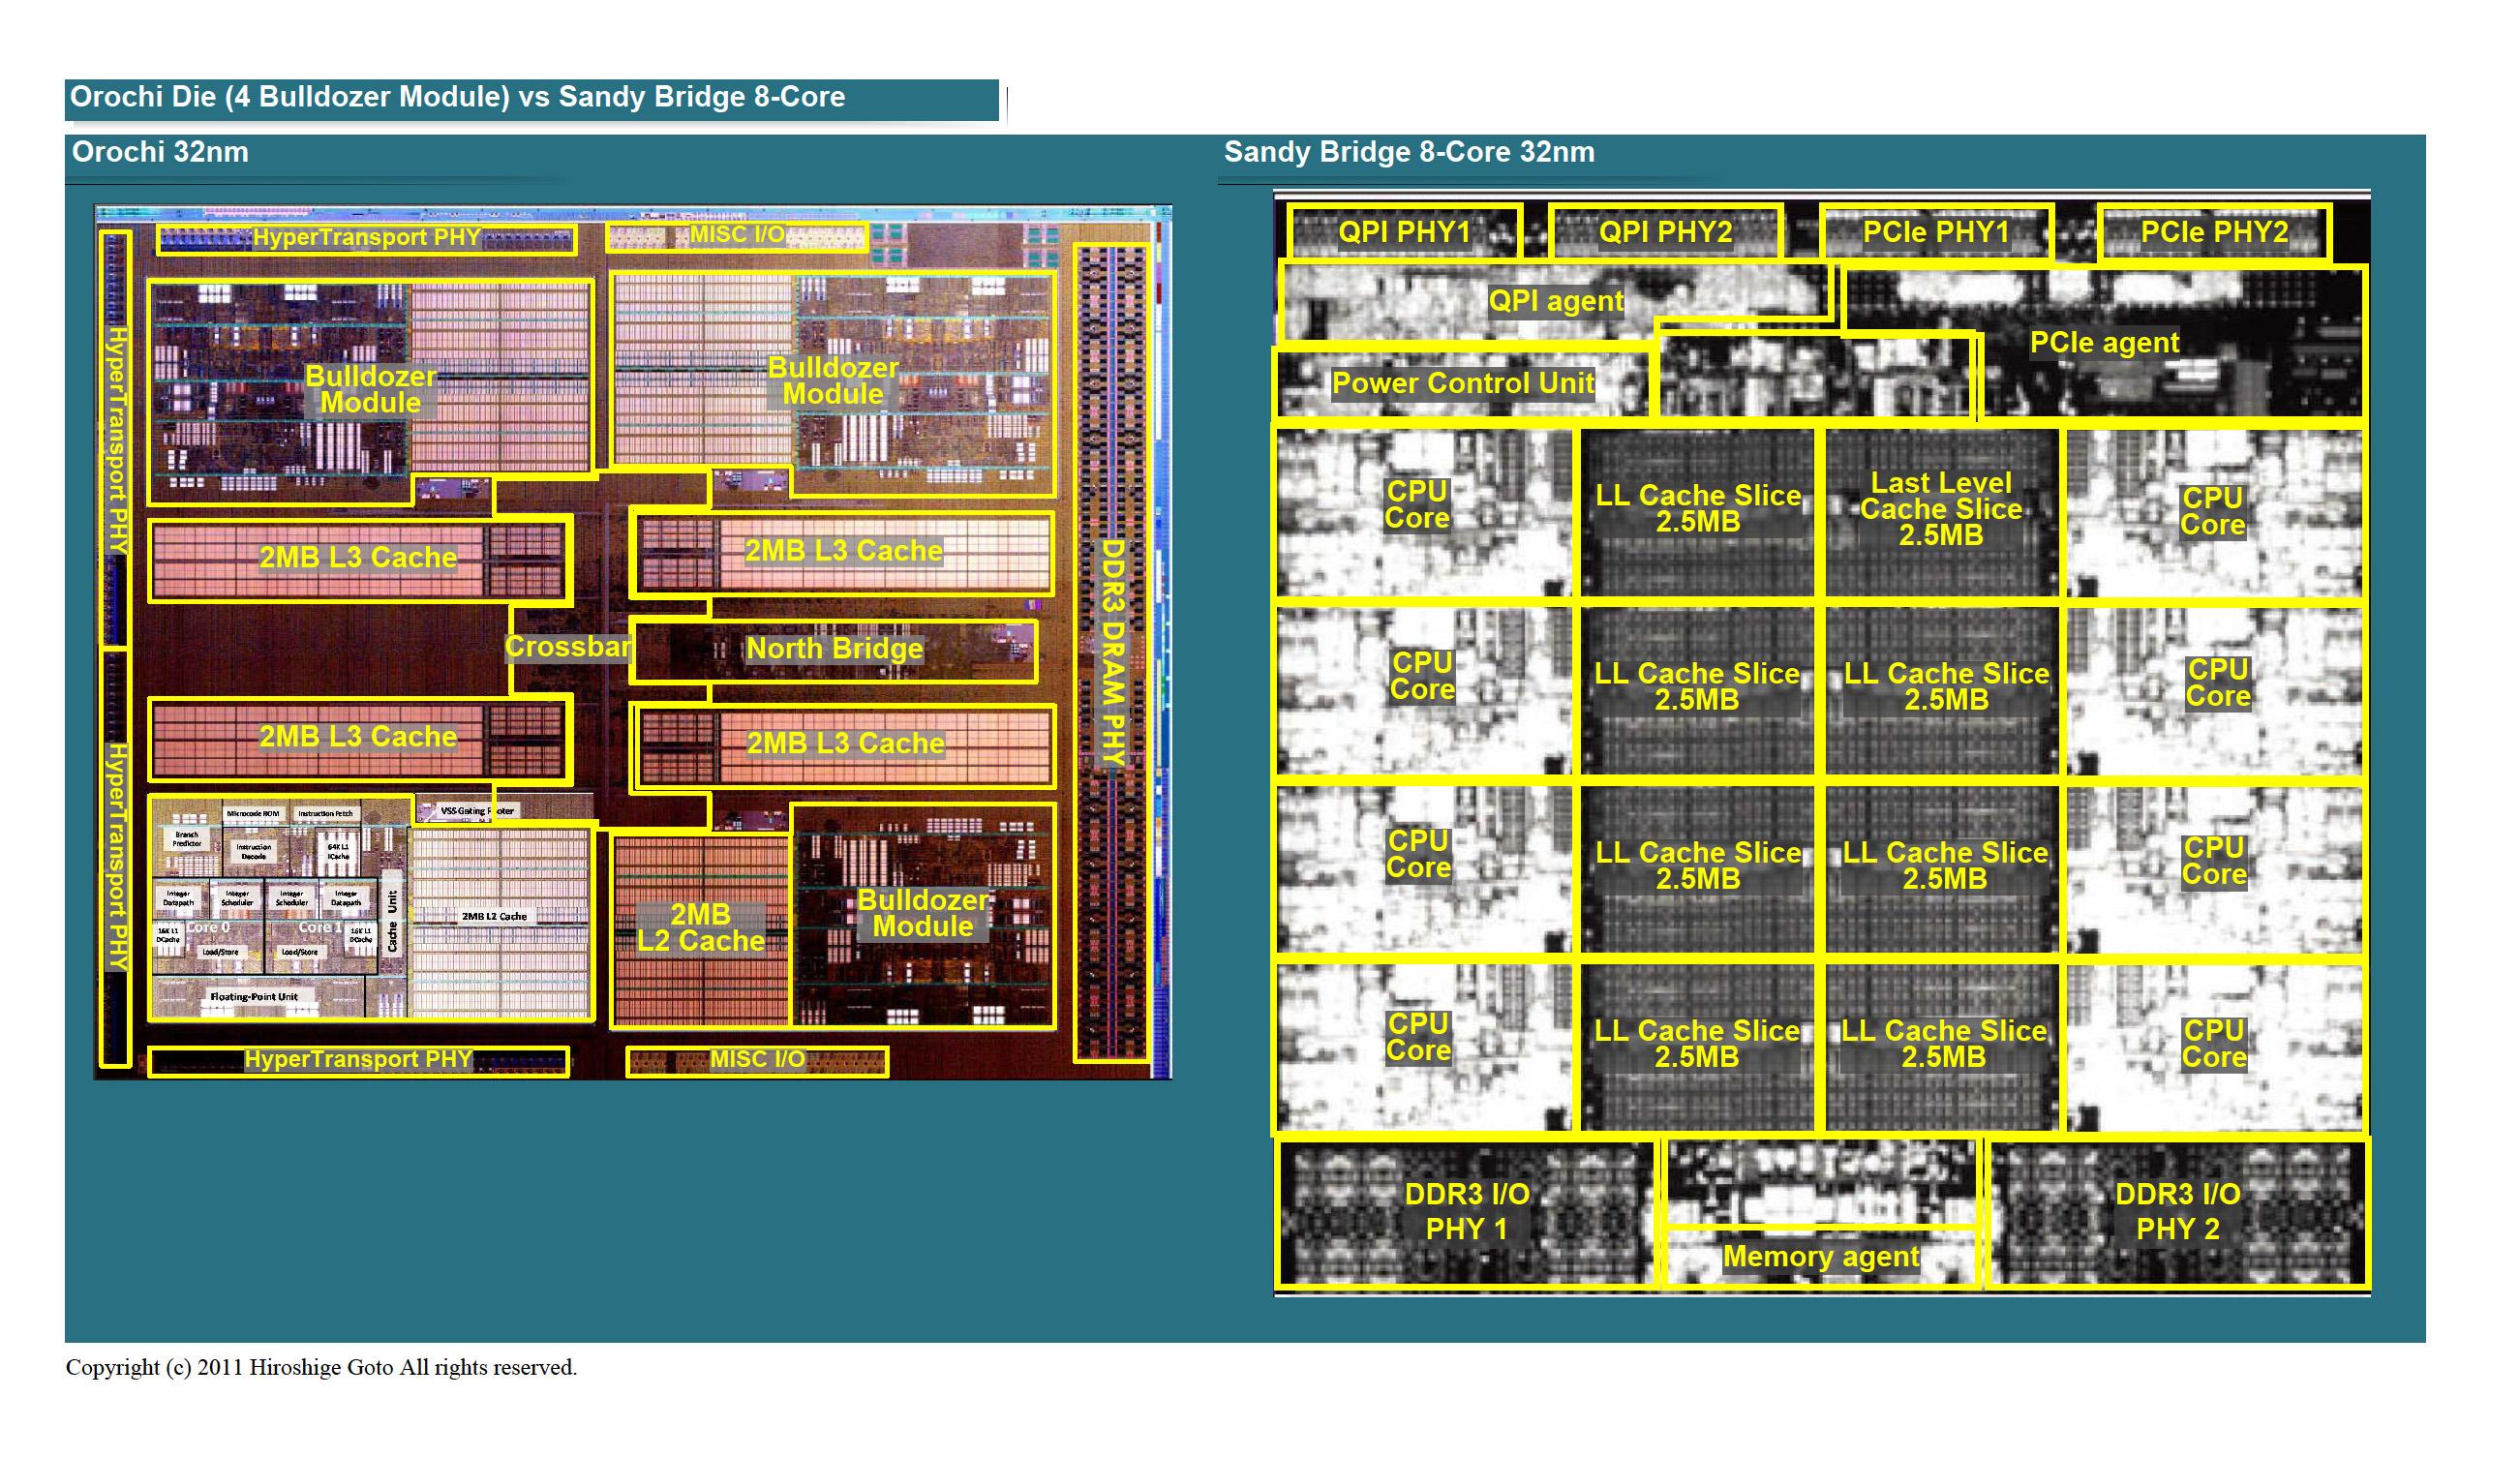 "OrochiのダイとSandy Bridge 8コアのダイ比較<br>PDF版は<a href=""/video/pcw/docs/473/823/p16.pdf"">こちら</a>"